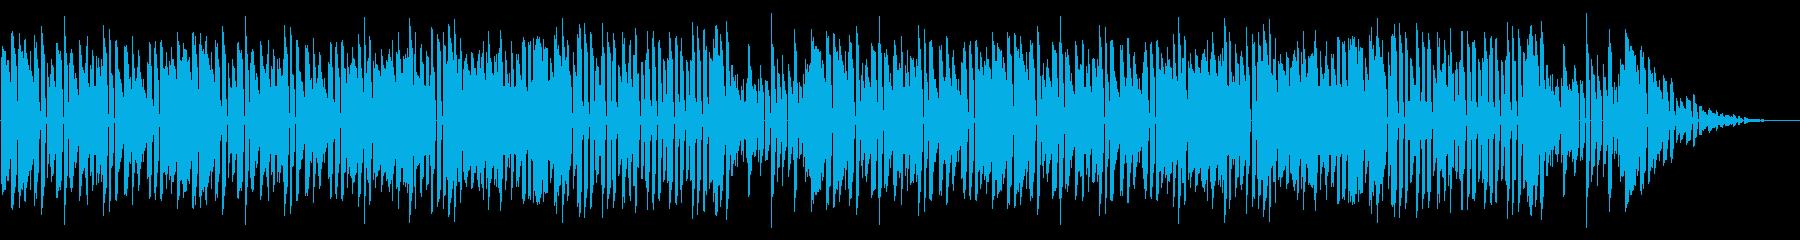 NES アクションD03-1(ステージ2の再生済みの波形